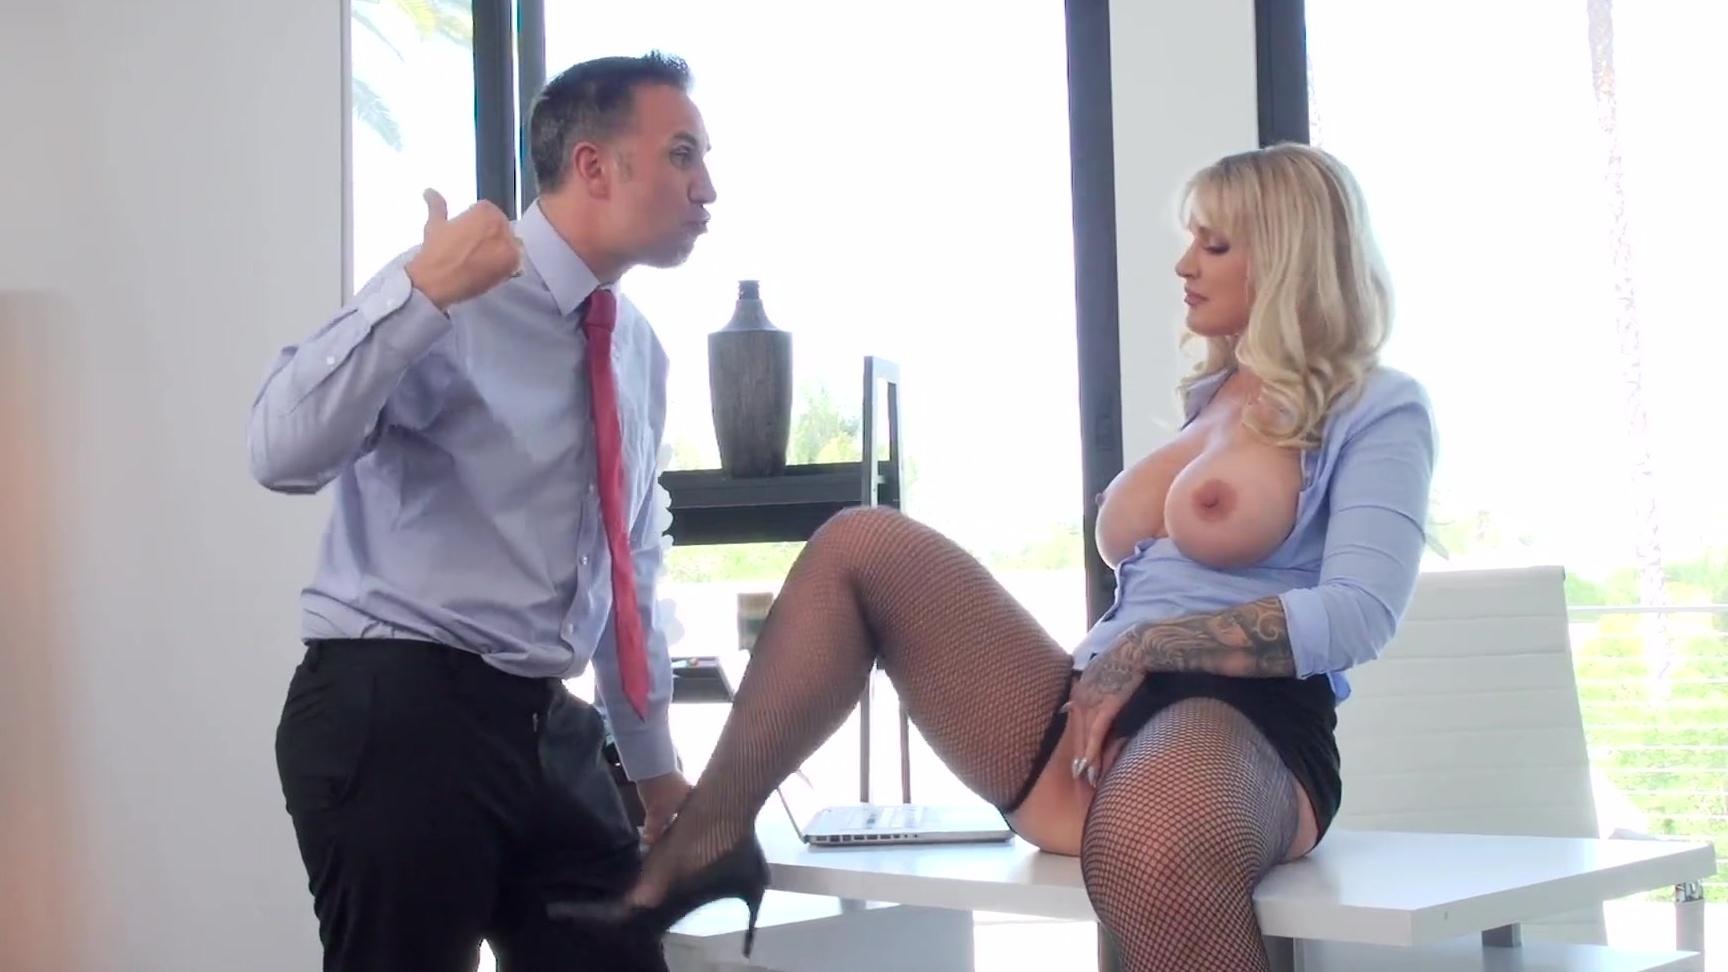 hot live sex webcams